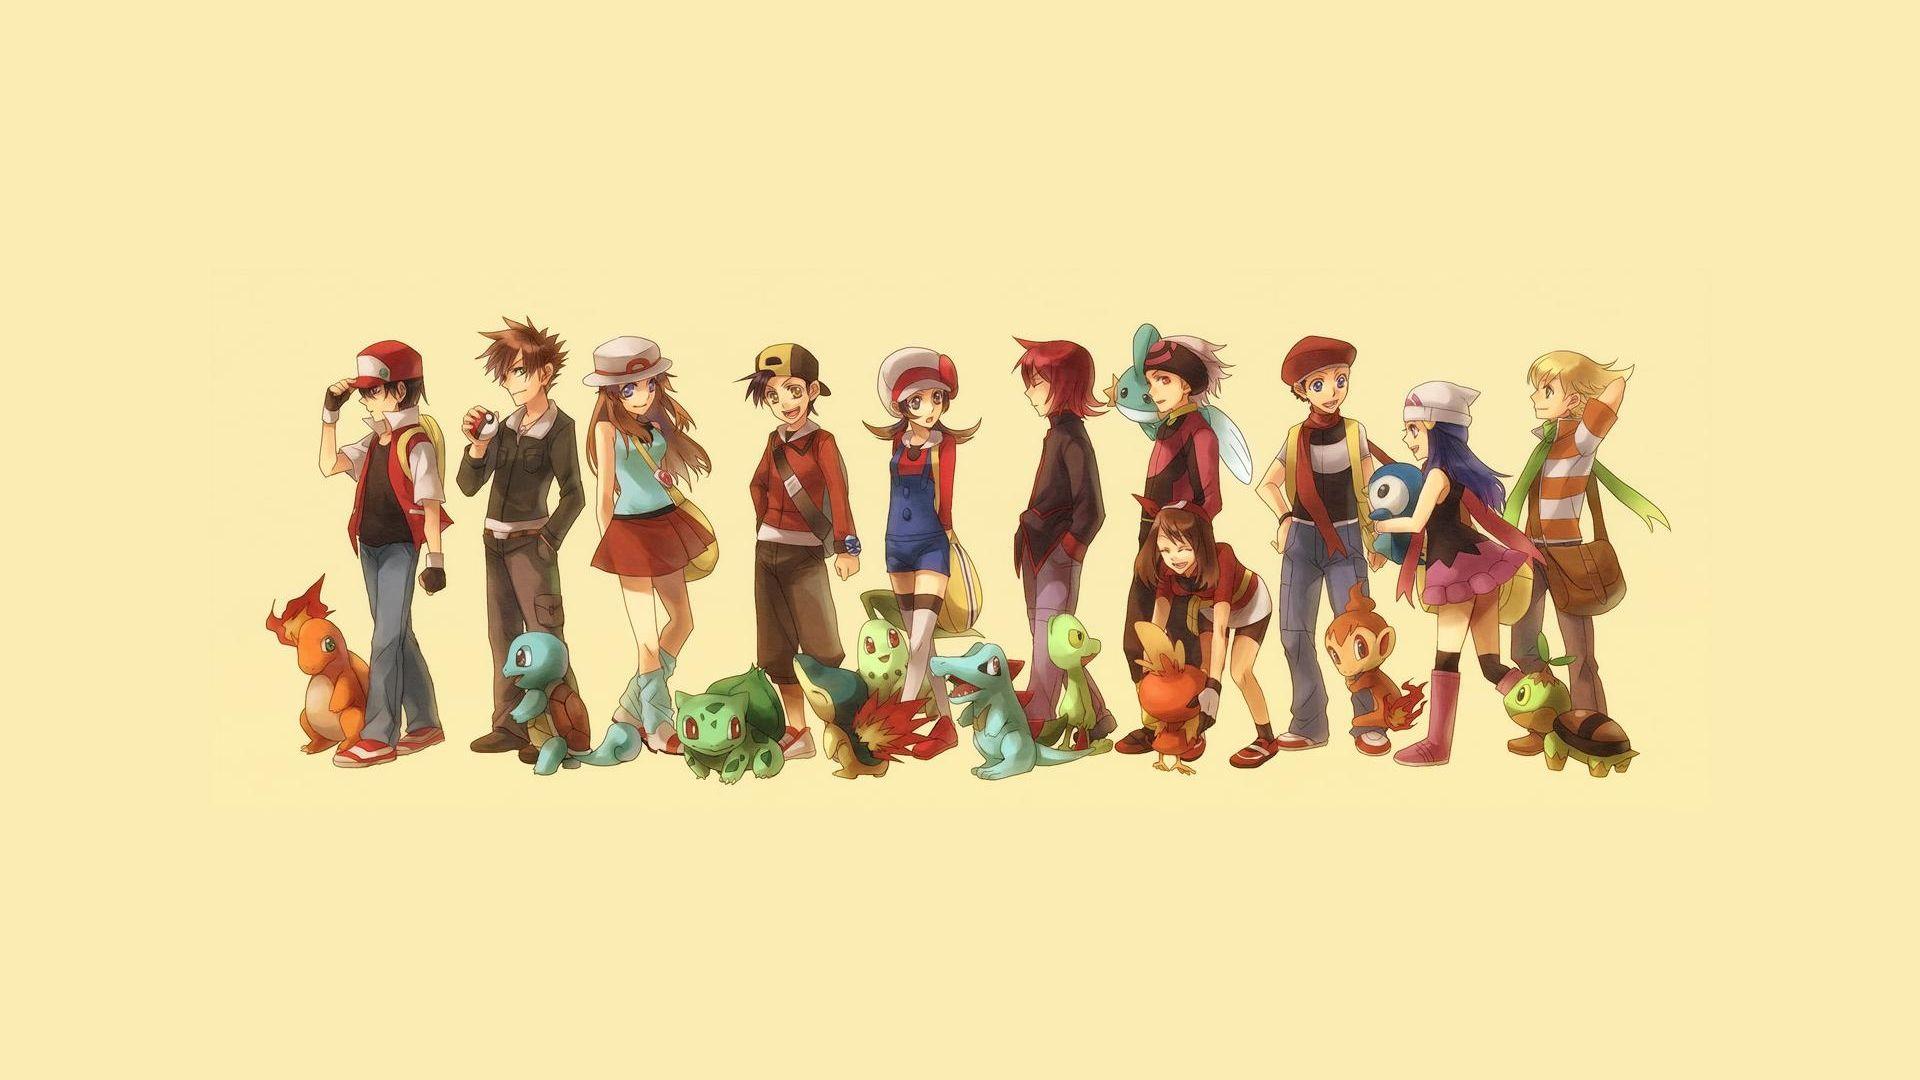 Pokémon HD Wallpaper | Background Image | 1920x1080 | ID:648213